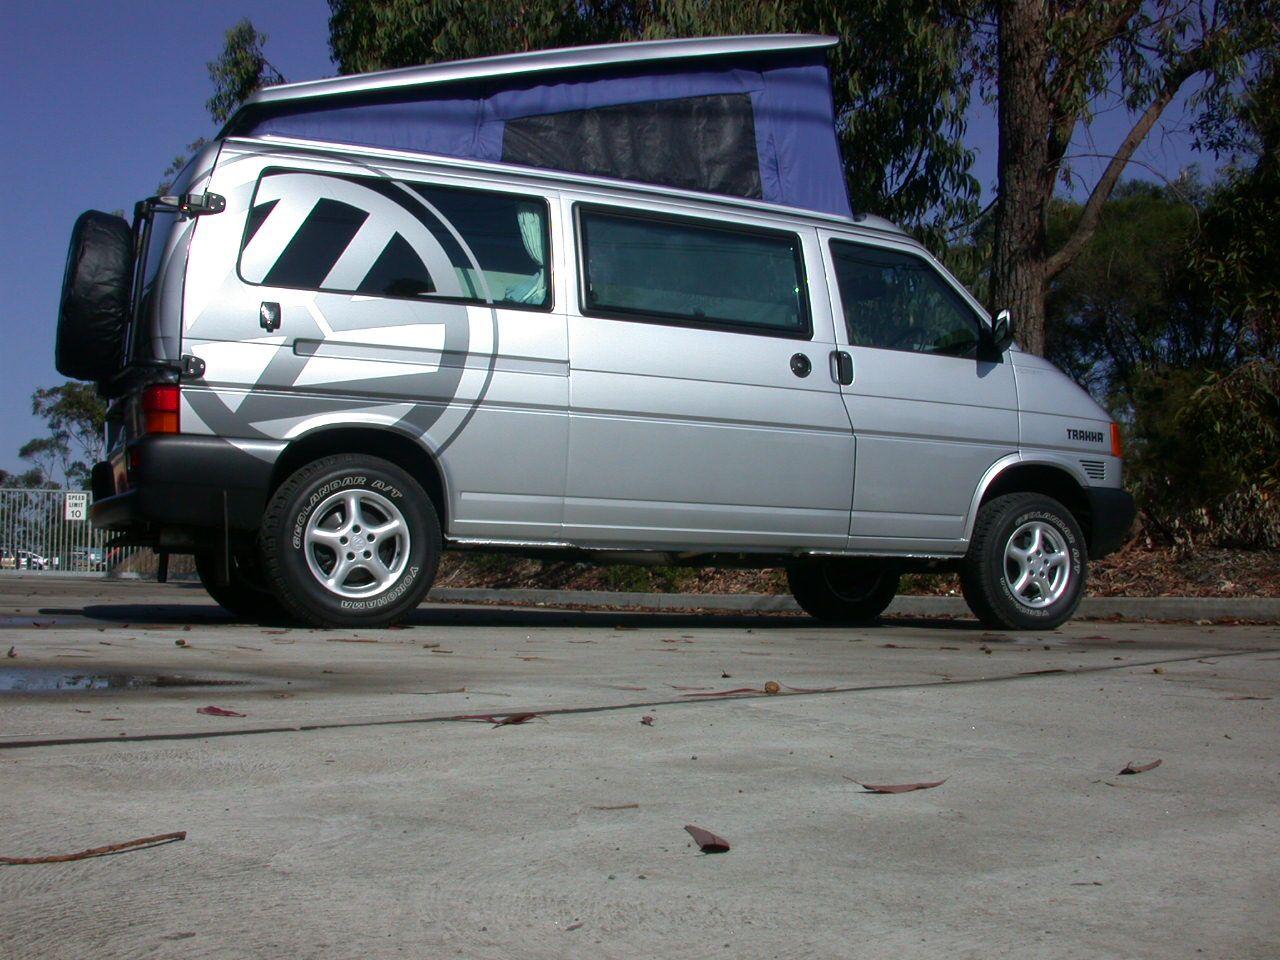 Trakka VW T4 pop top campervan Trakka history